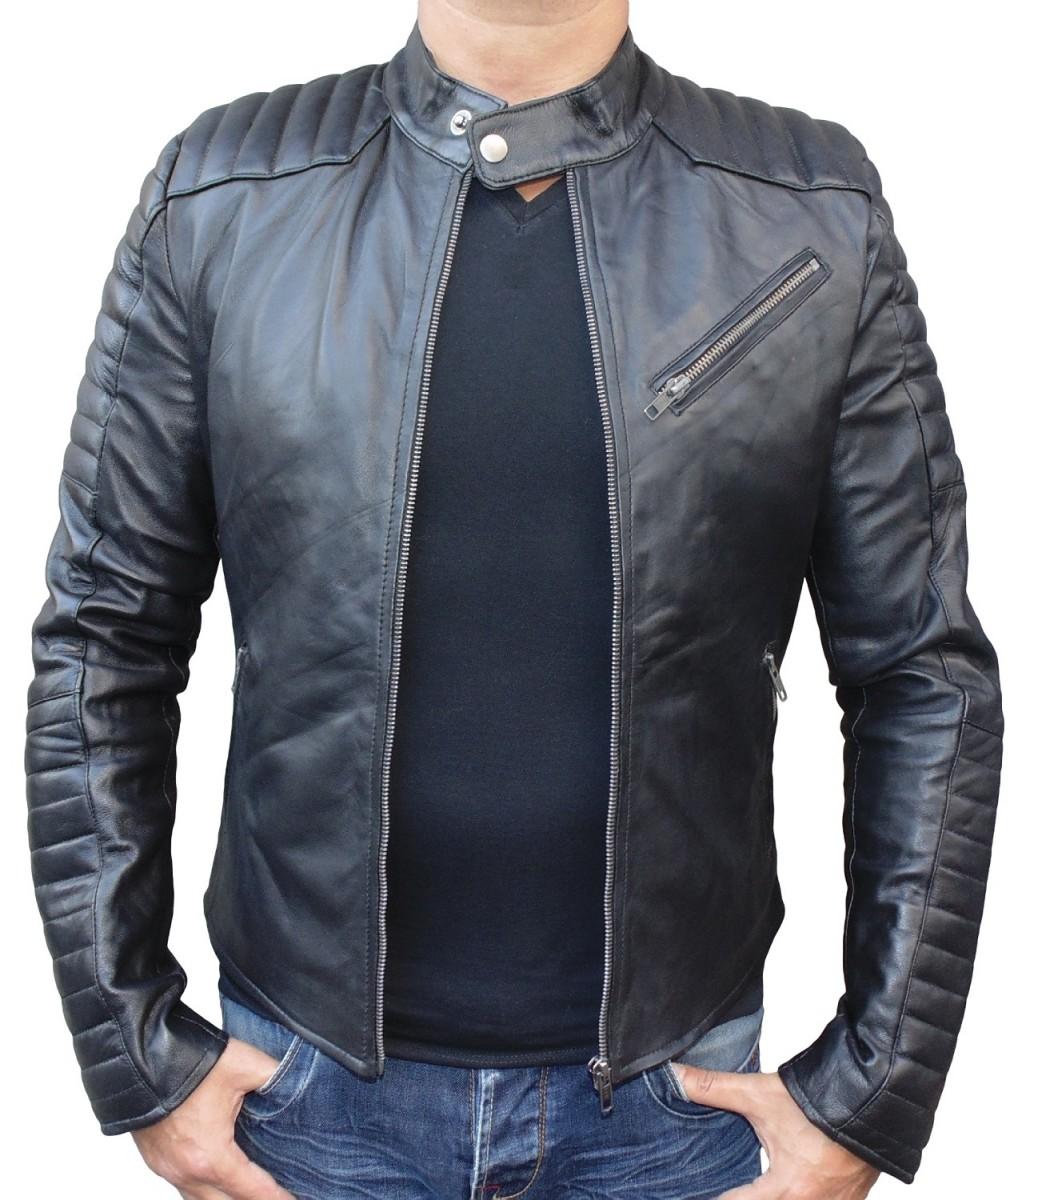 Veste cuir noir homme